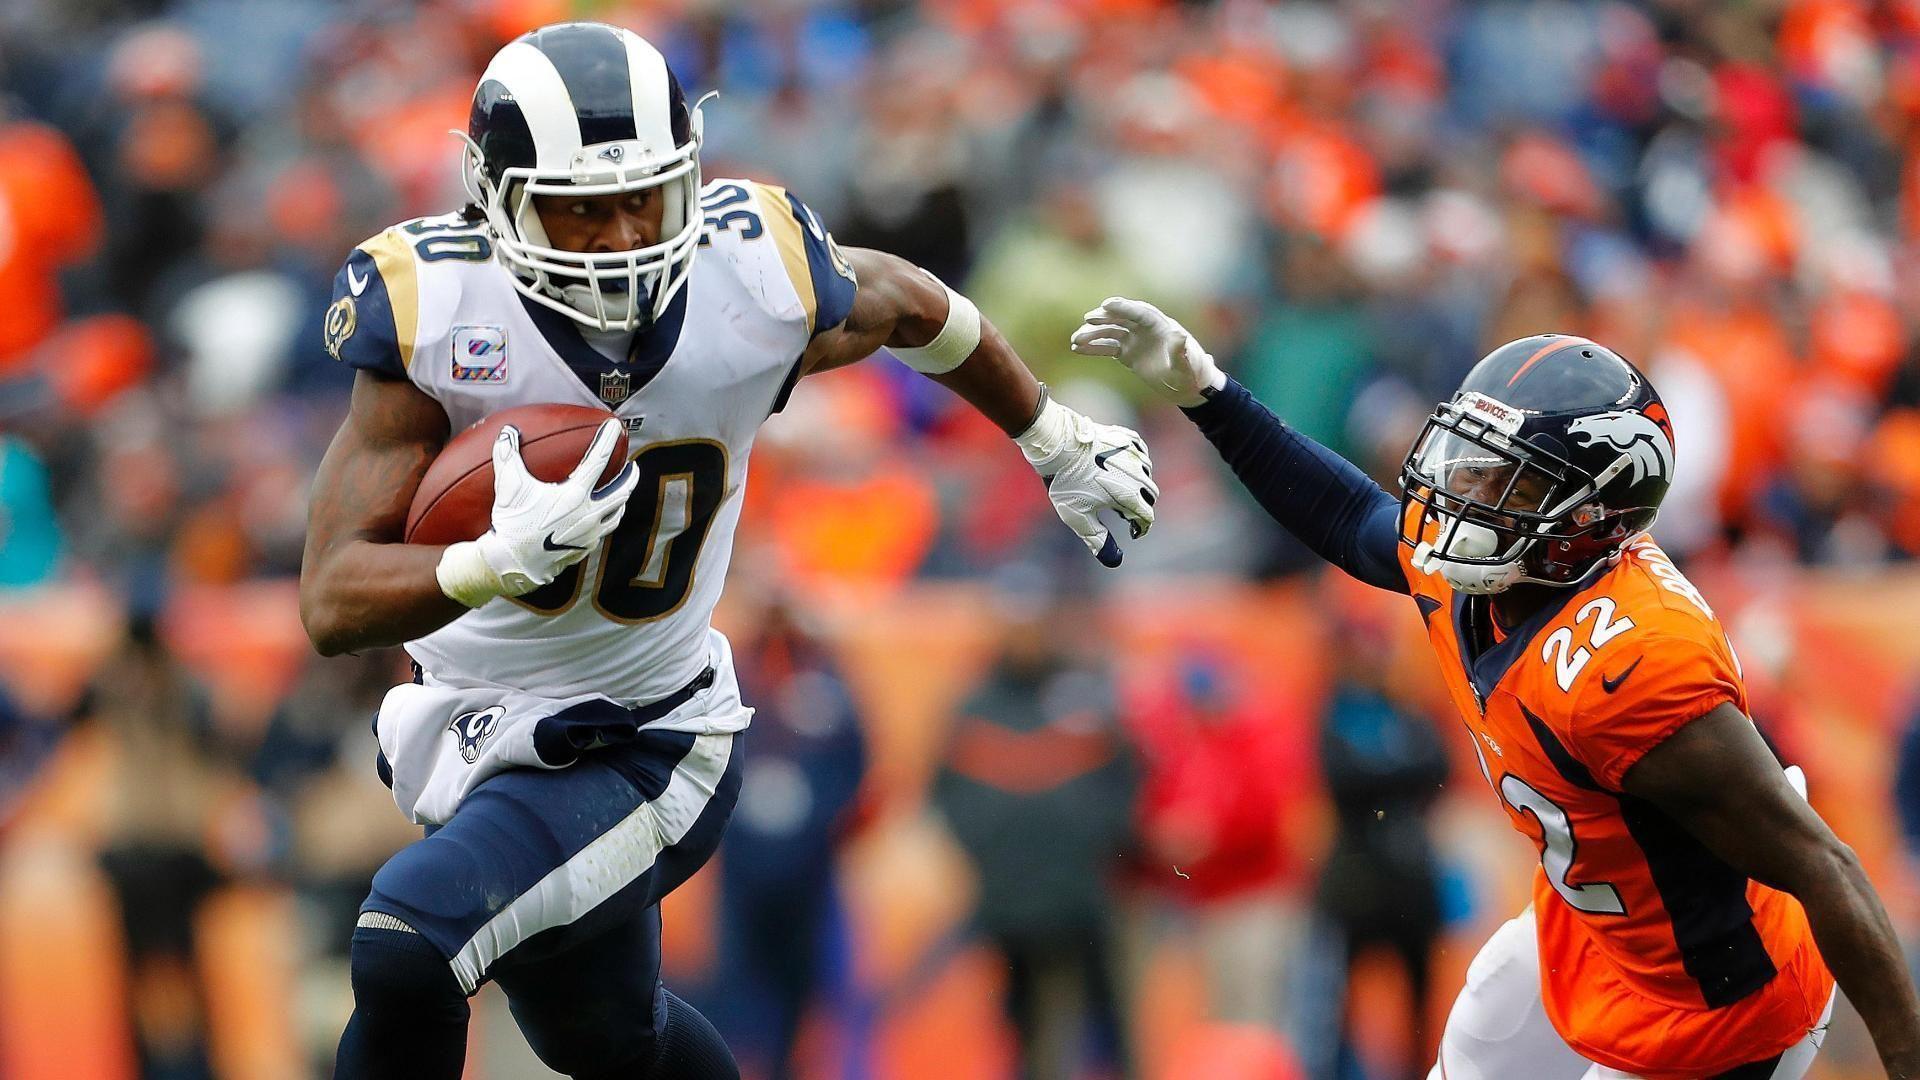 Gurley posts first career 200-yard rushing game